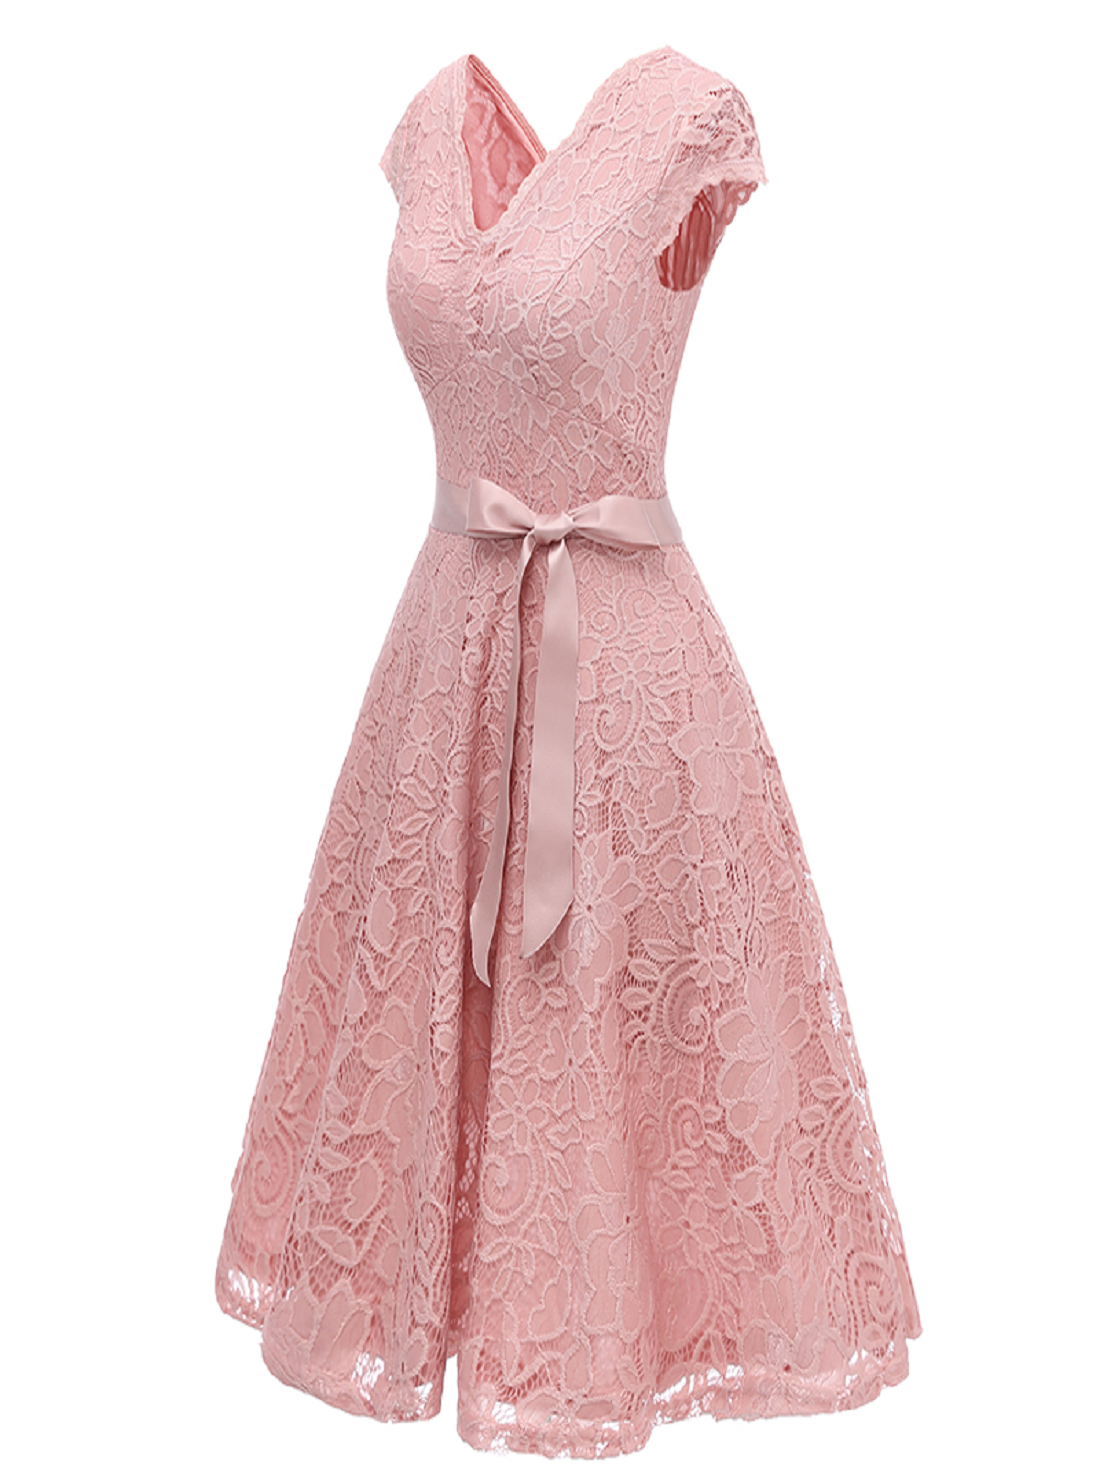 Floral Lace Formal Dress